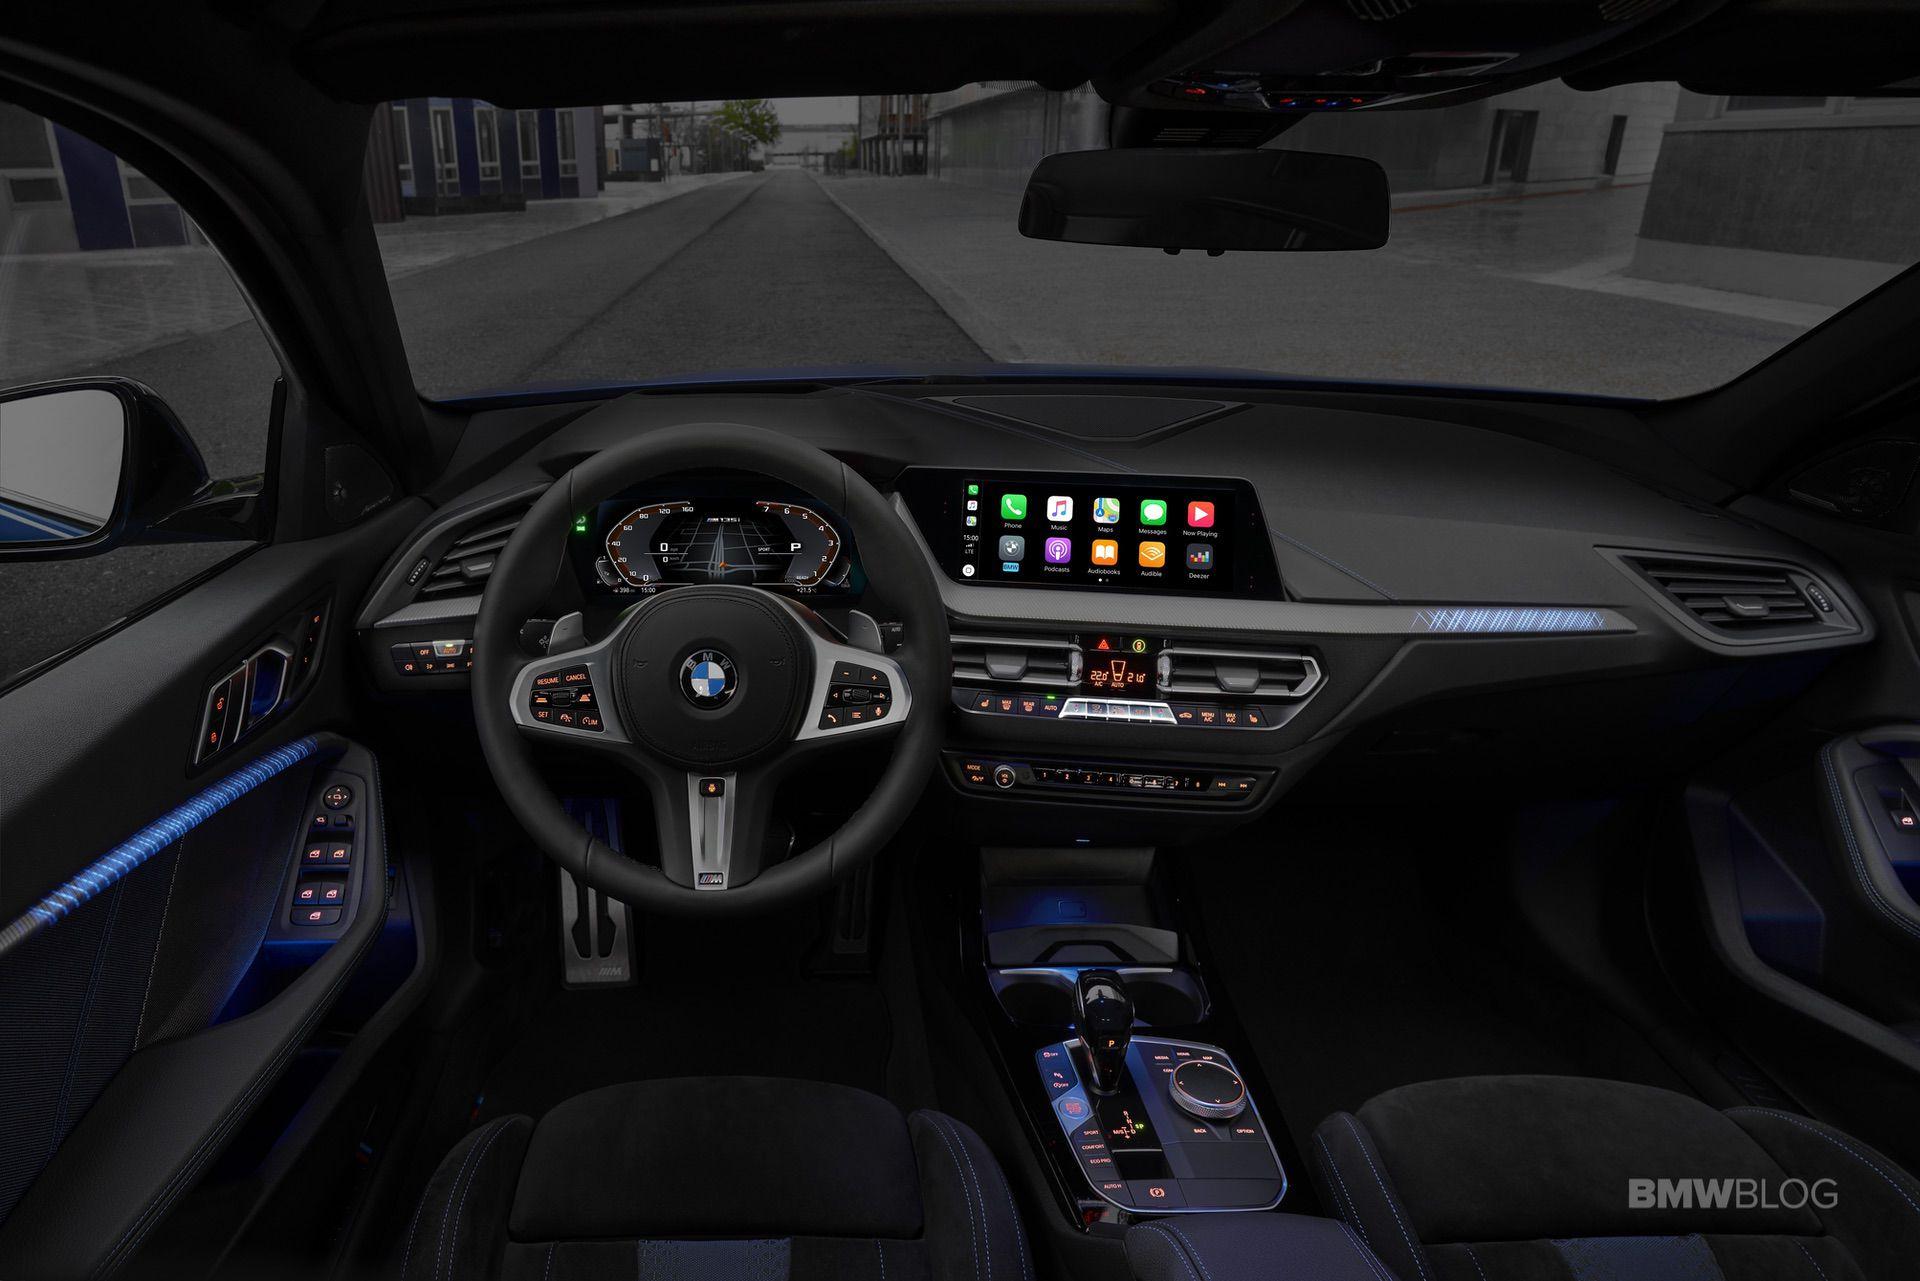 2020-BMW-M135i-xDrive-Misano-Blue-34.jpg